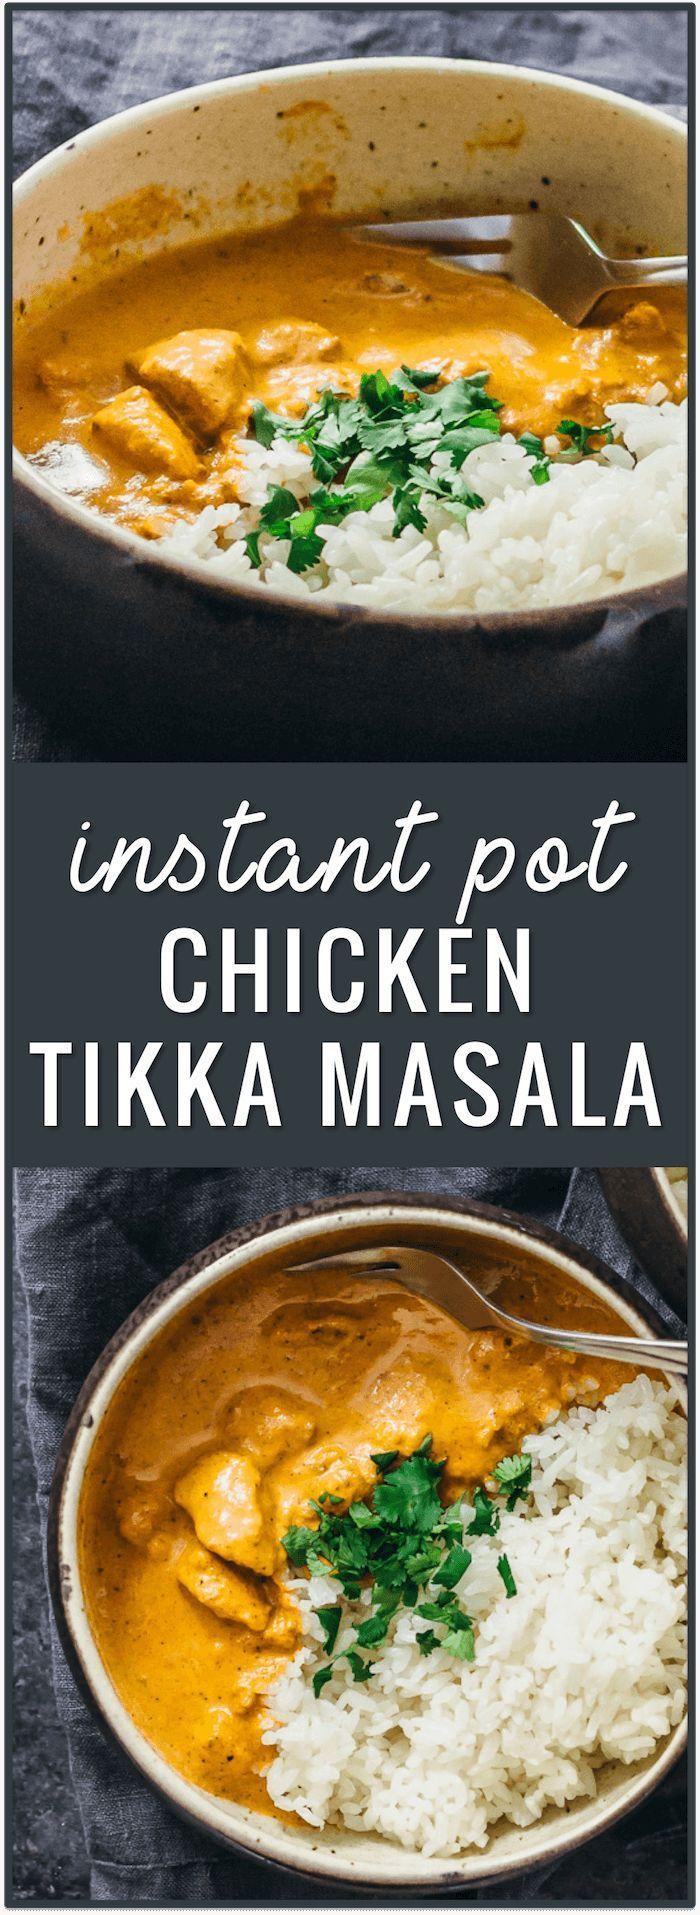 Instant pot chicken tikka masala recipe pressure cooker chicken instant pot chicken tikka masala recipe pressure cooker chicken curry dinner recipe forumfinder Images